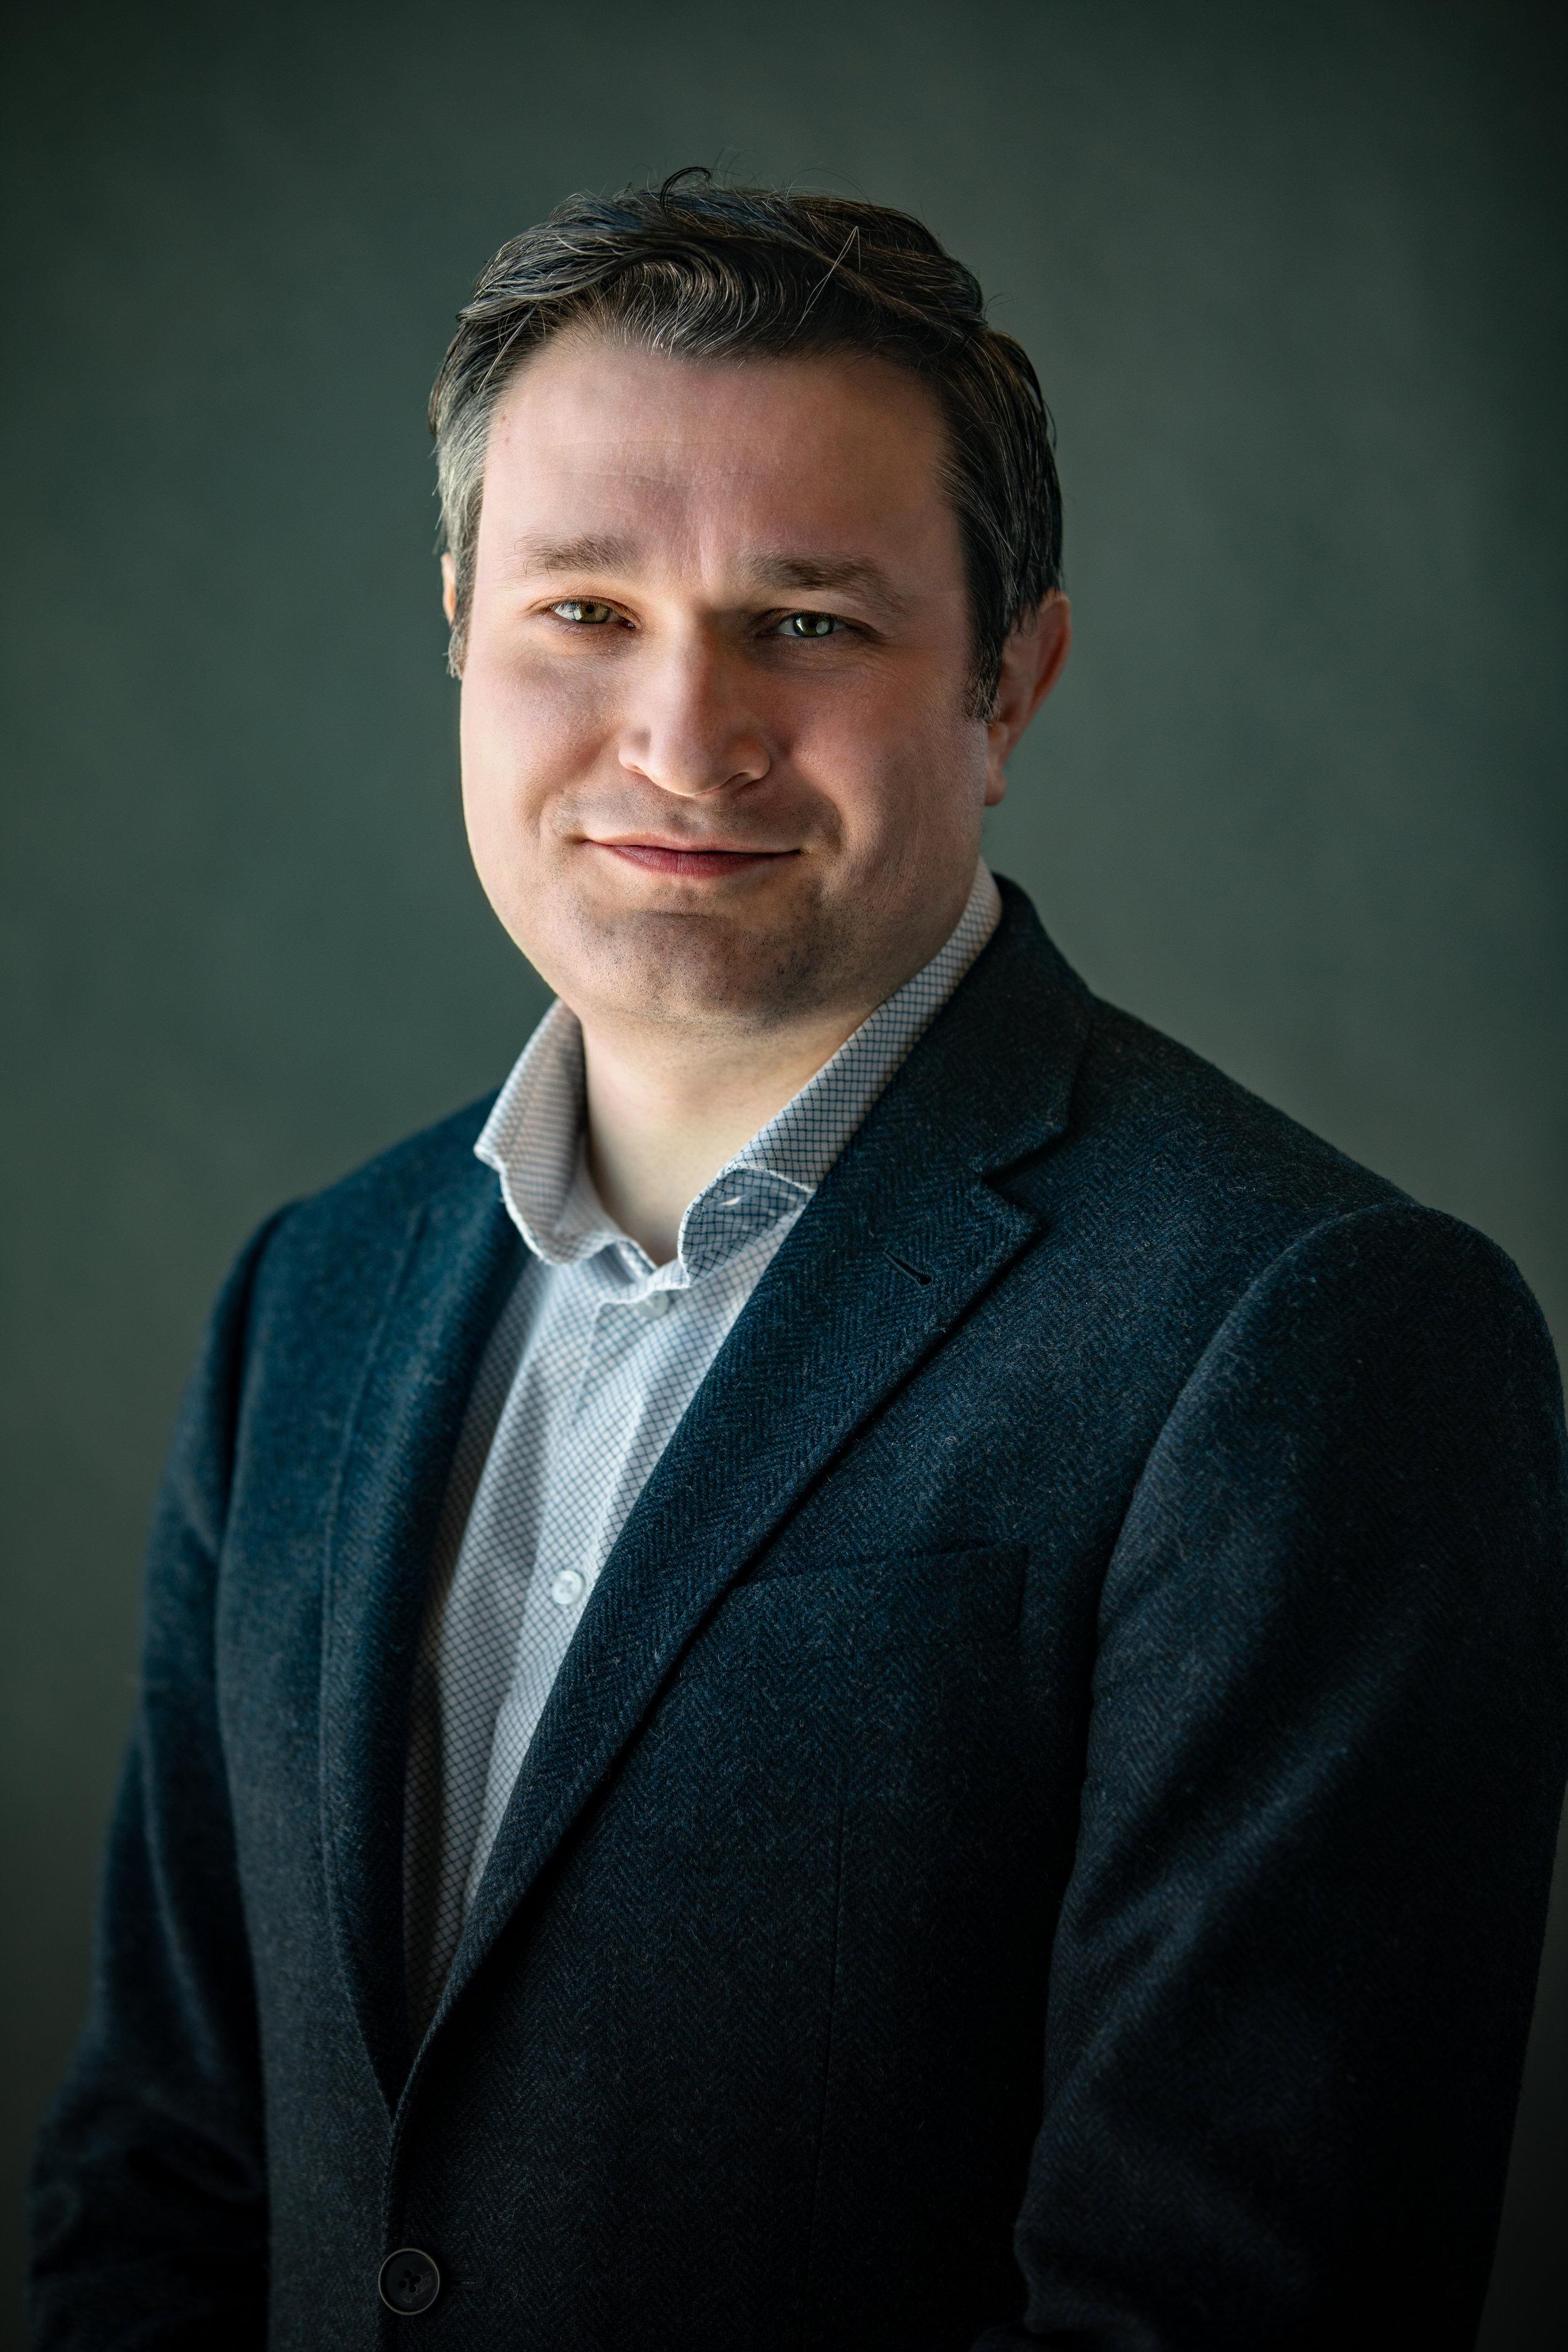 Andrew Chernevych, Archivist